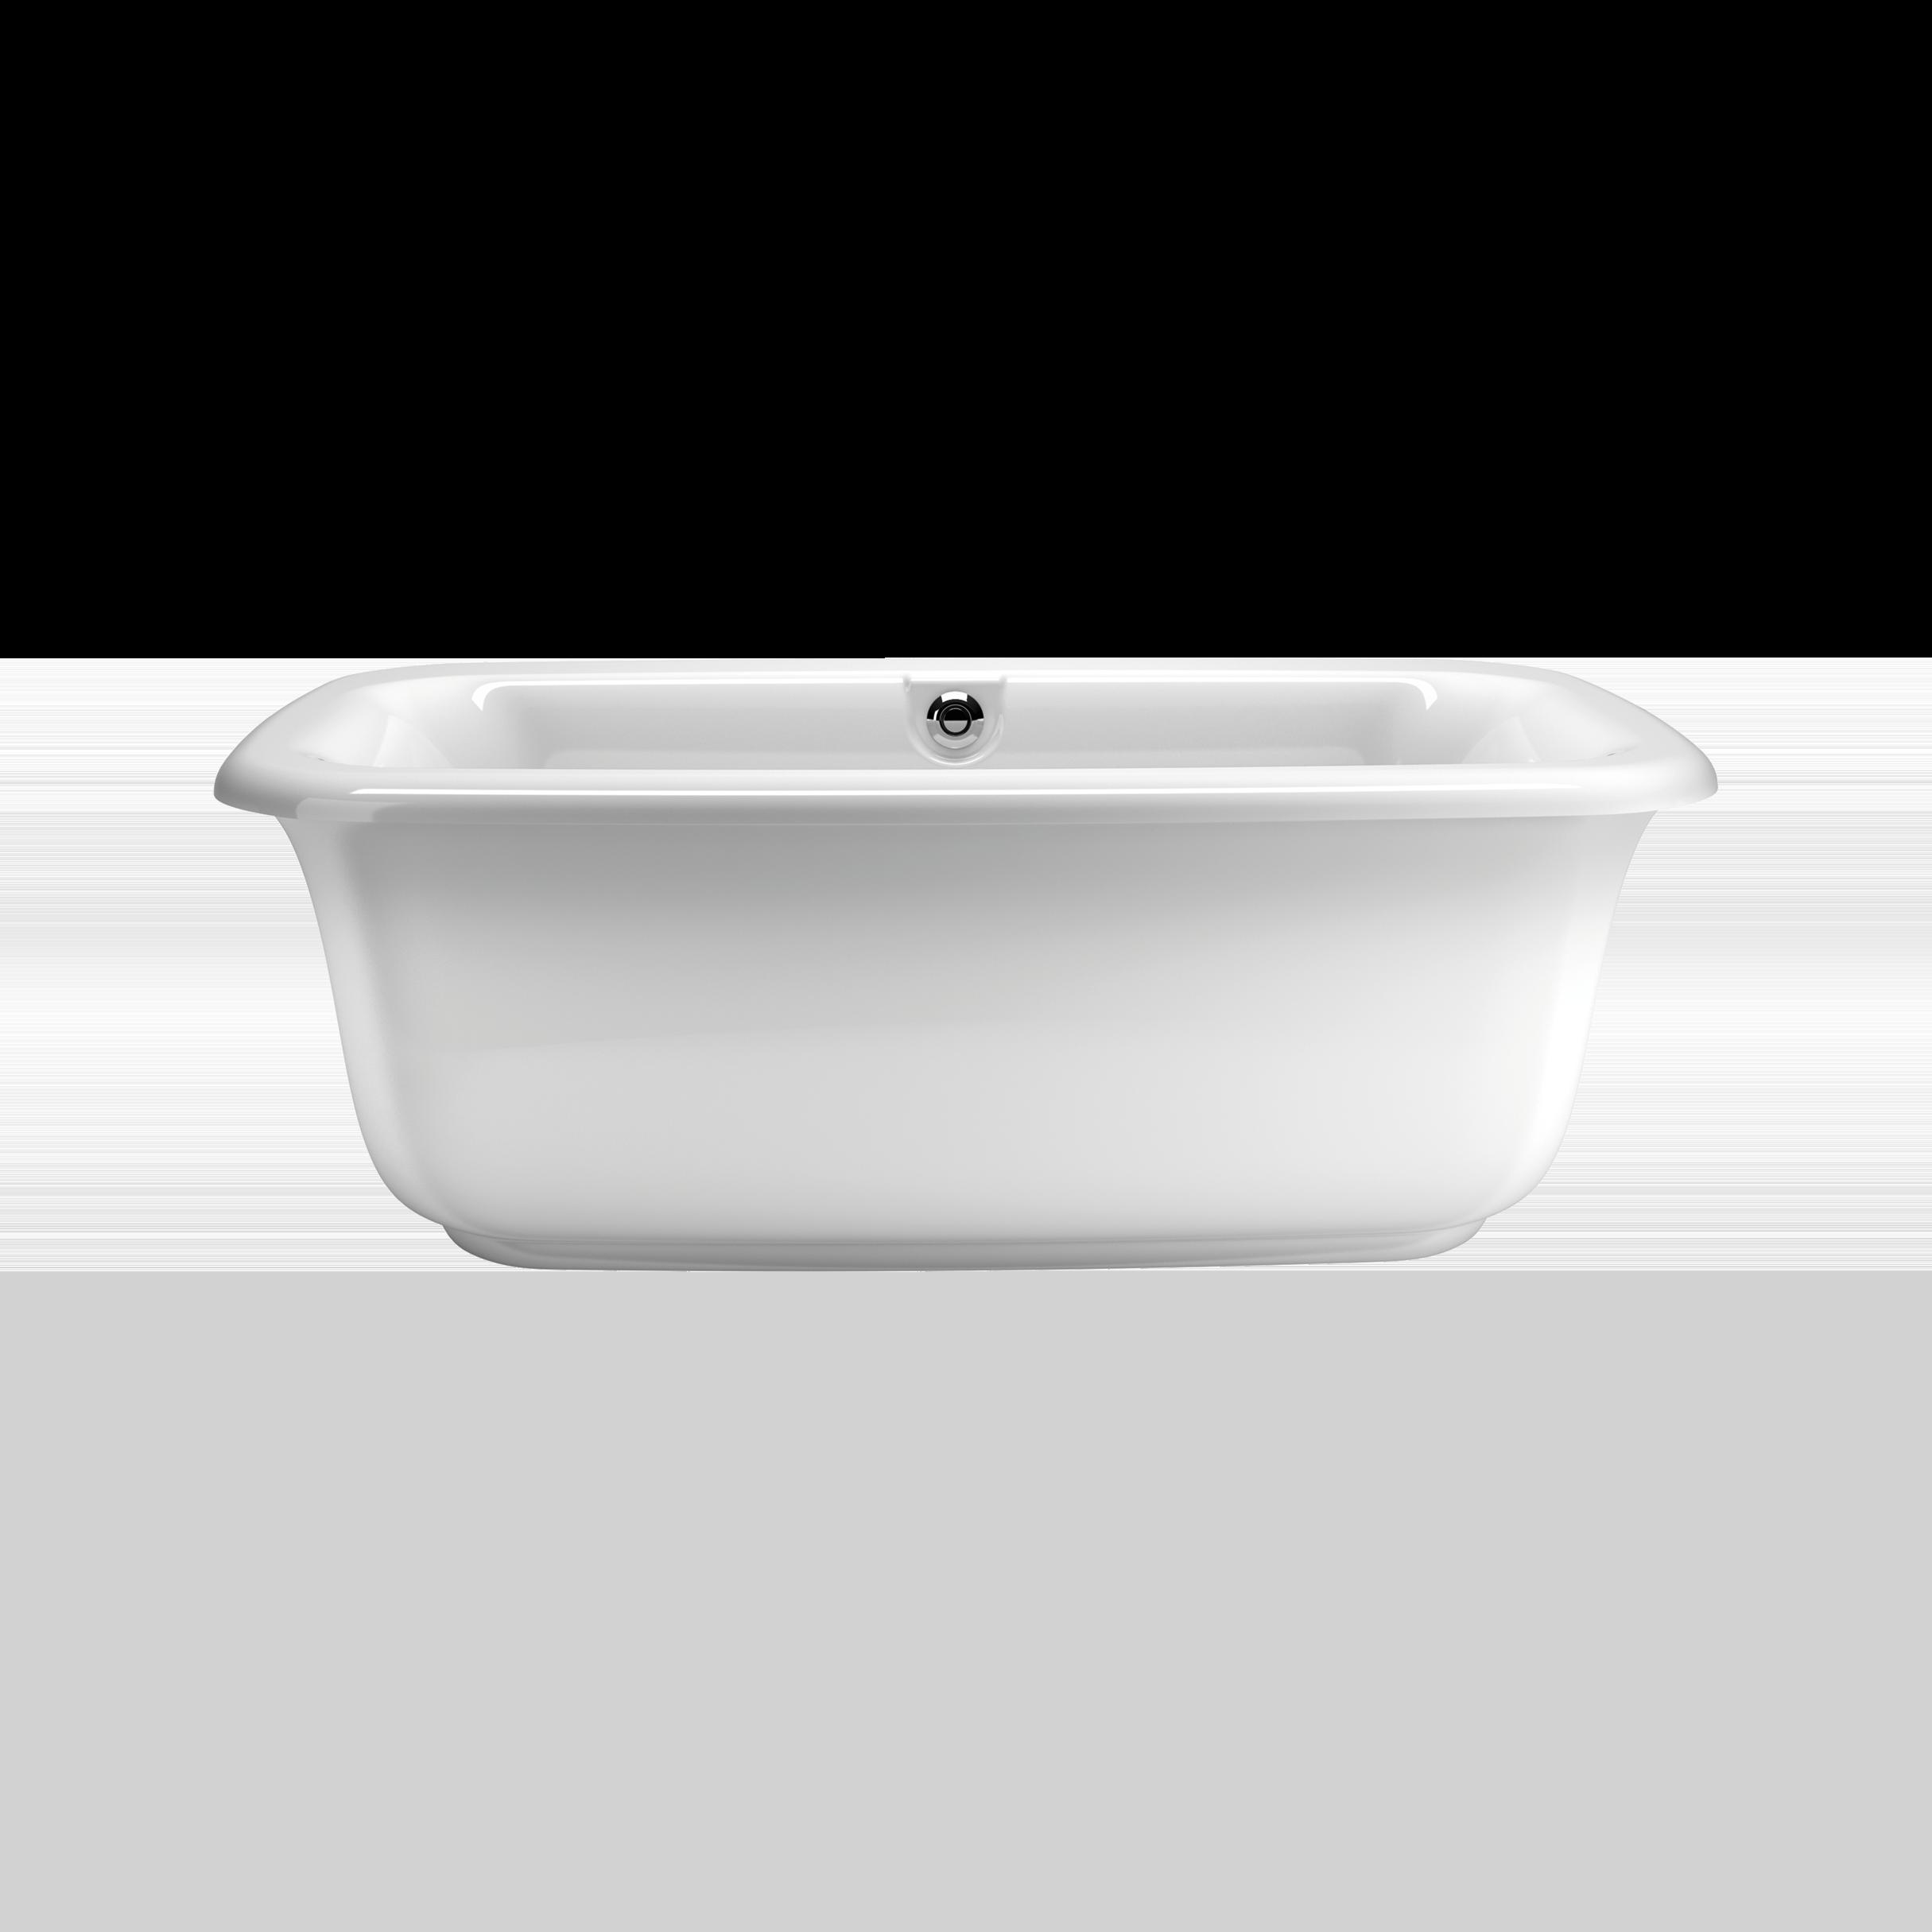 Maax 105756-000 Miles 6636 Freestanding Soaker Tub | Tubs and Bath